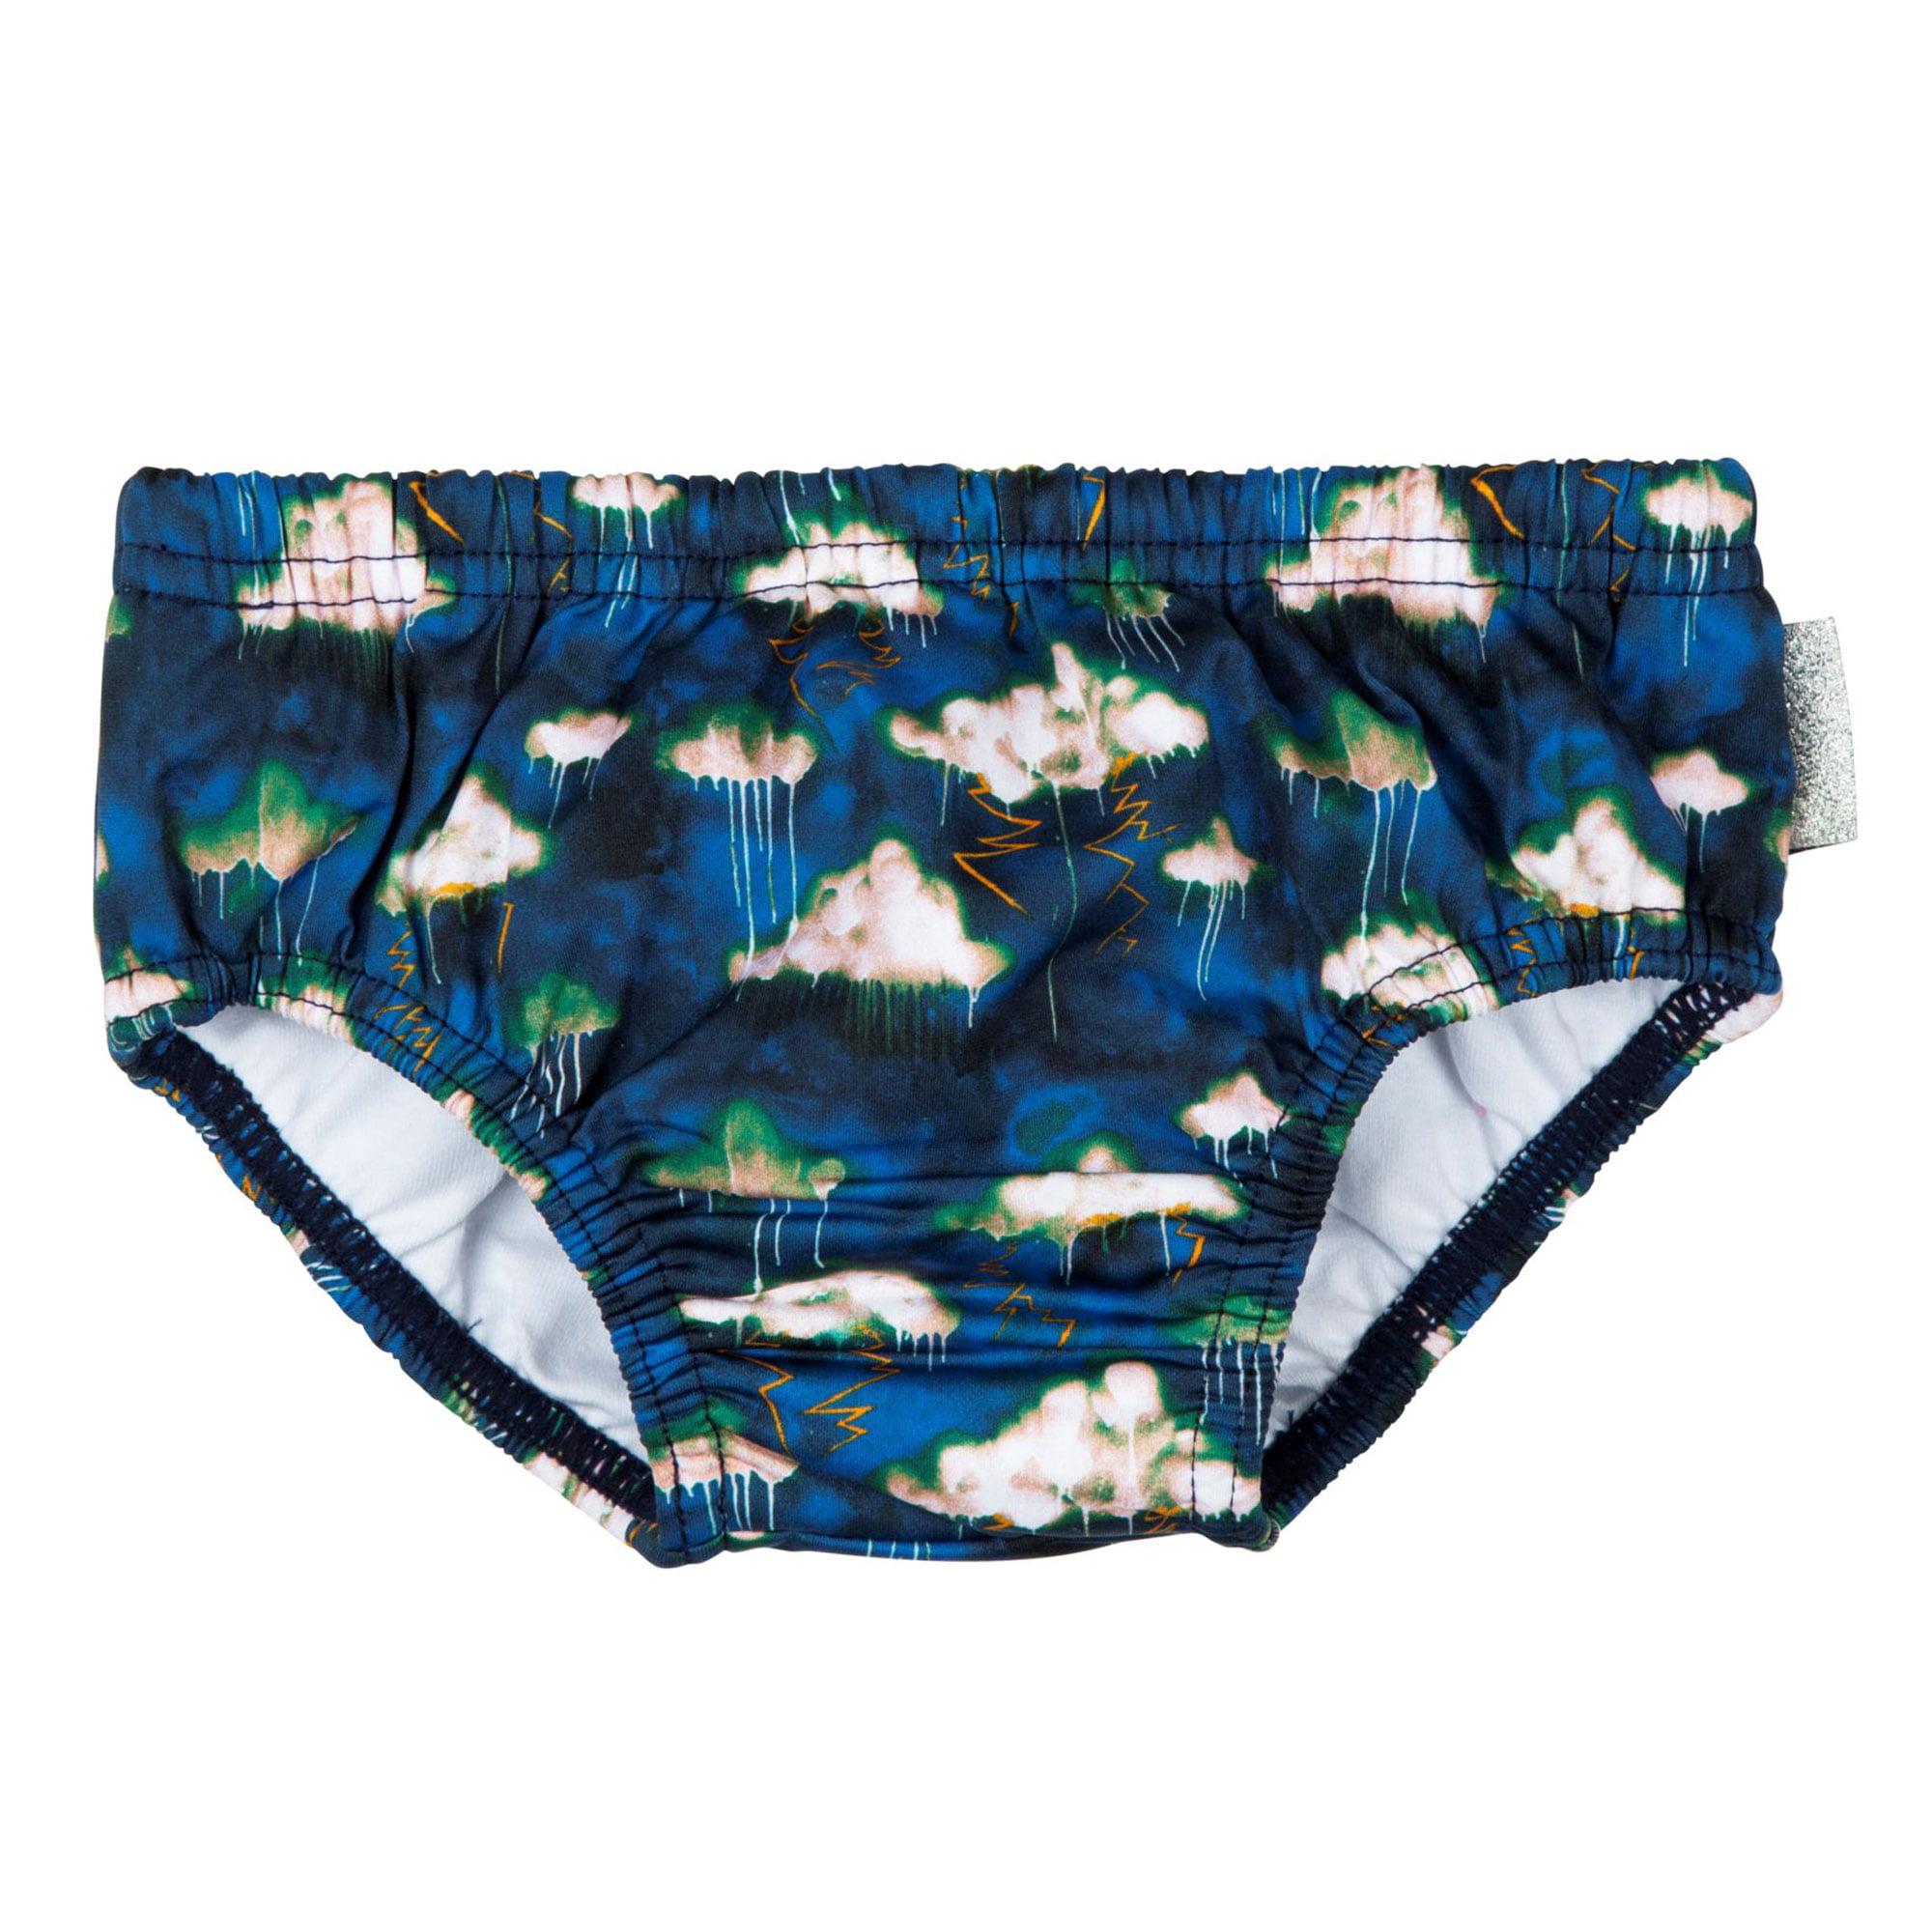 Rashoodz Cloth Reusable Baby Swim Diaper Nappy Sea Elements 0 9-12 Months